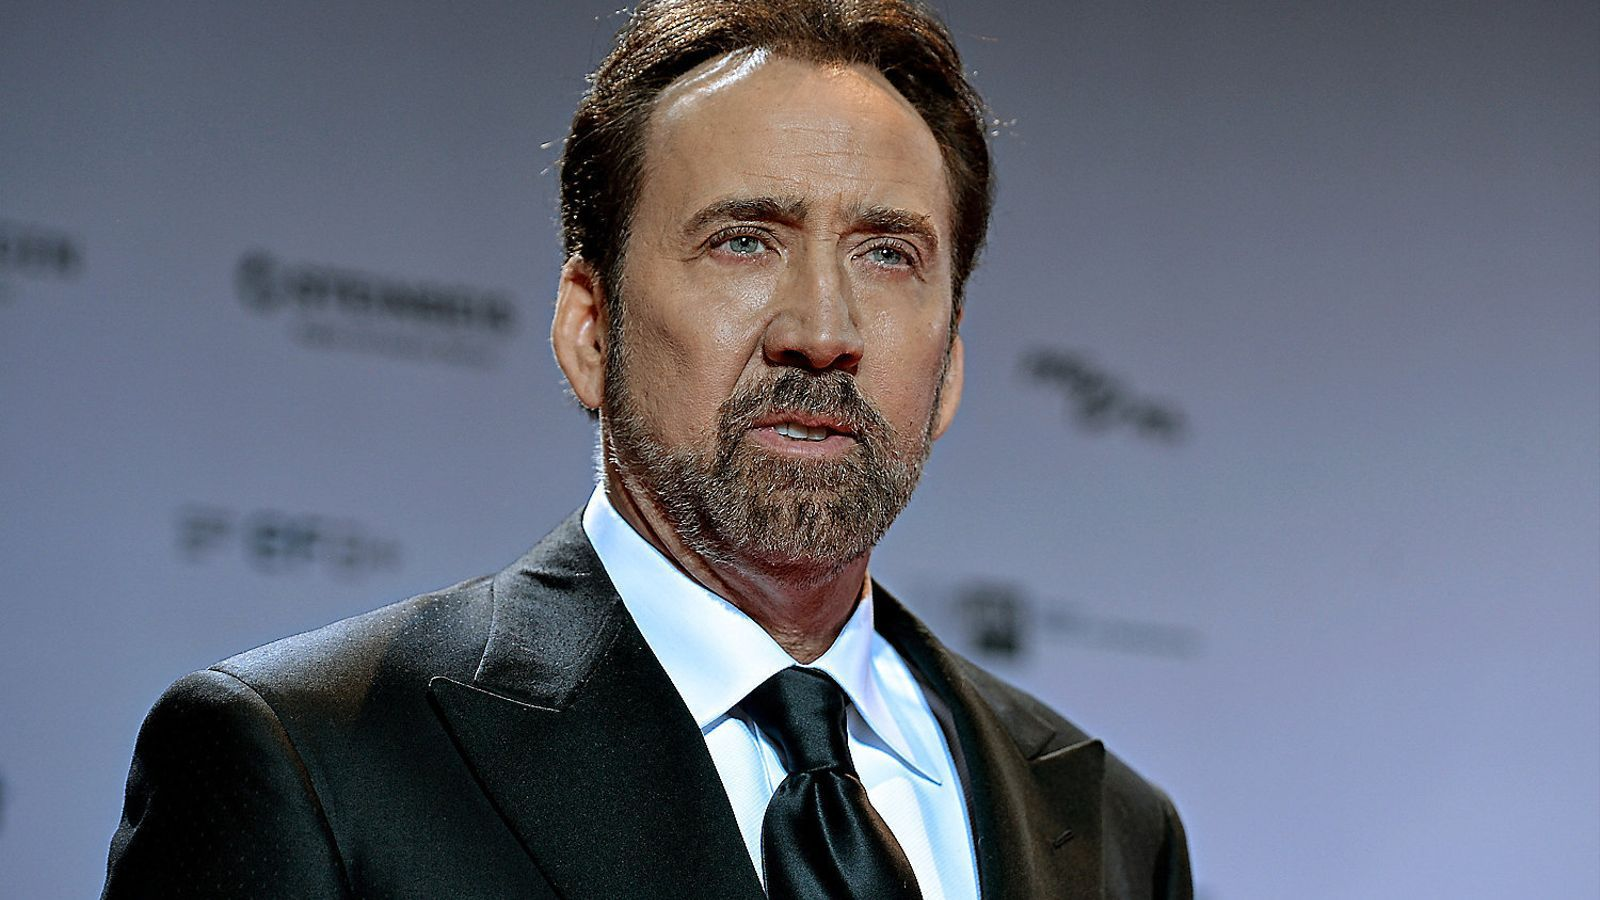 Nicolas Cage passejarà carisma icònic a Sitges